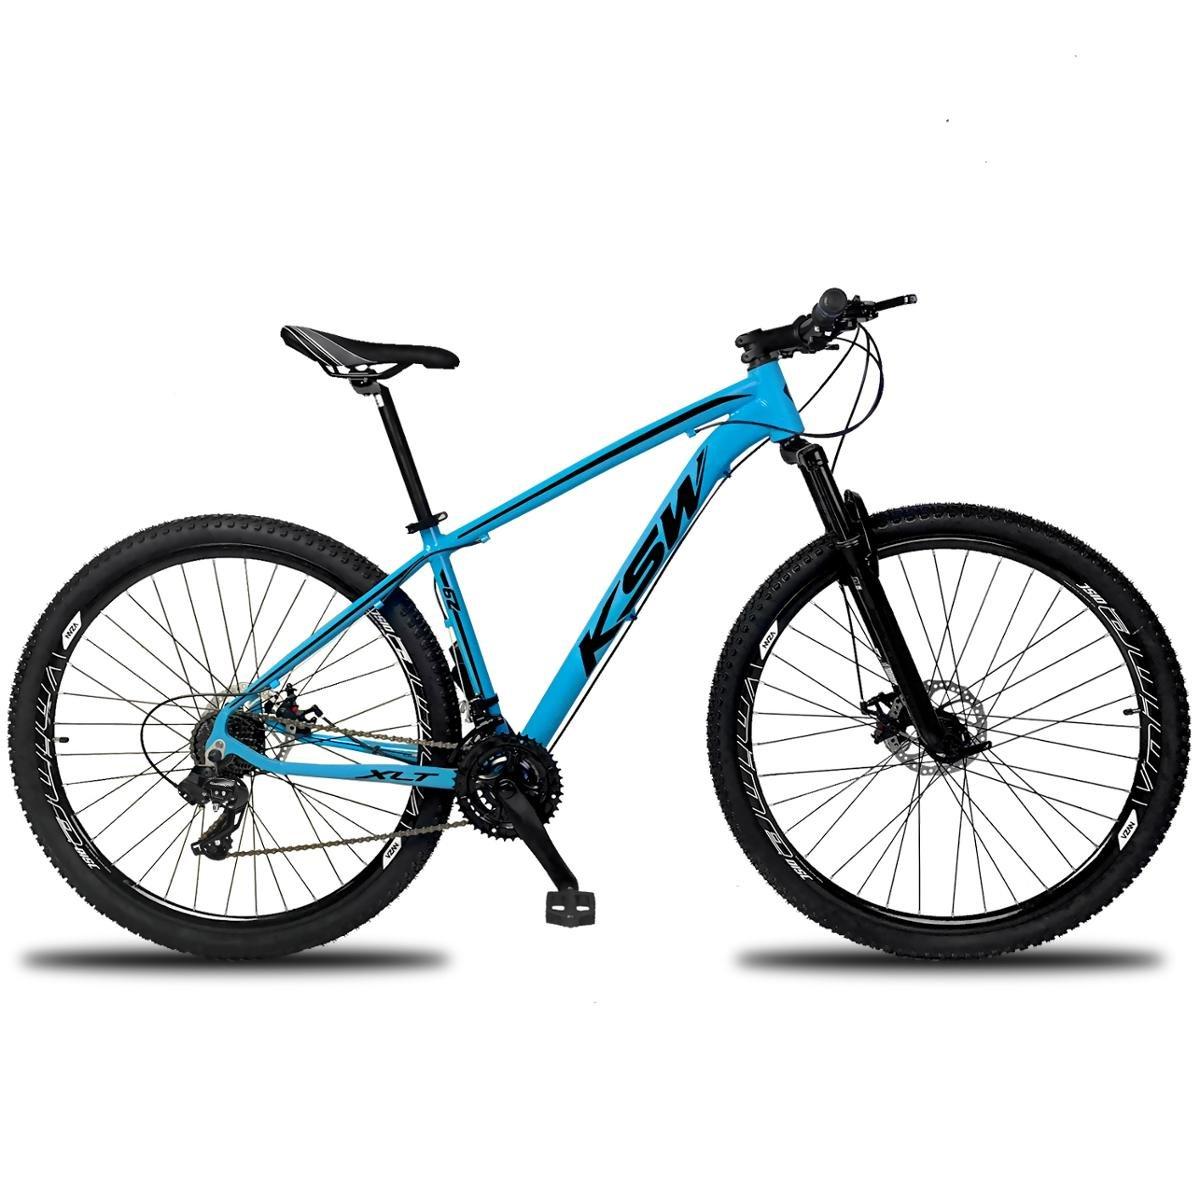 Bicicleta Ksw Xlt Tx-800 Disc M T19 Aro 29 Susp. Dianteira 24 Marchas - Azul/preto